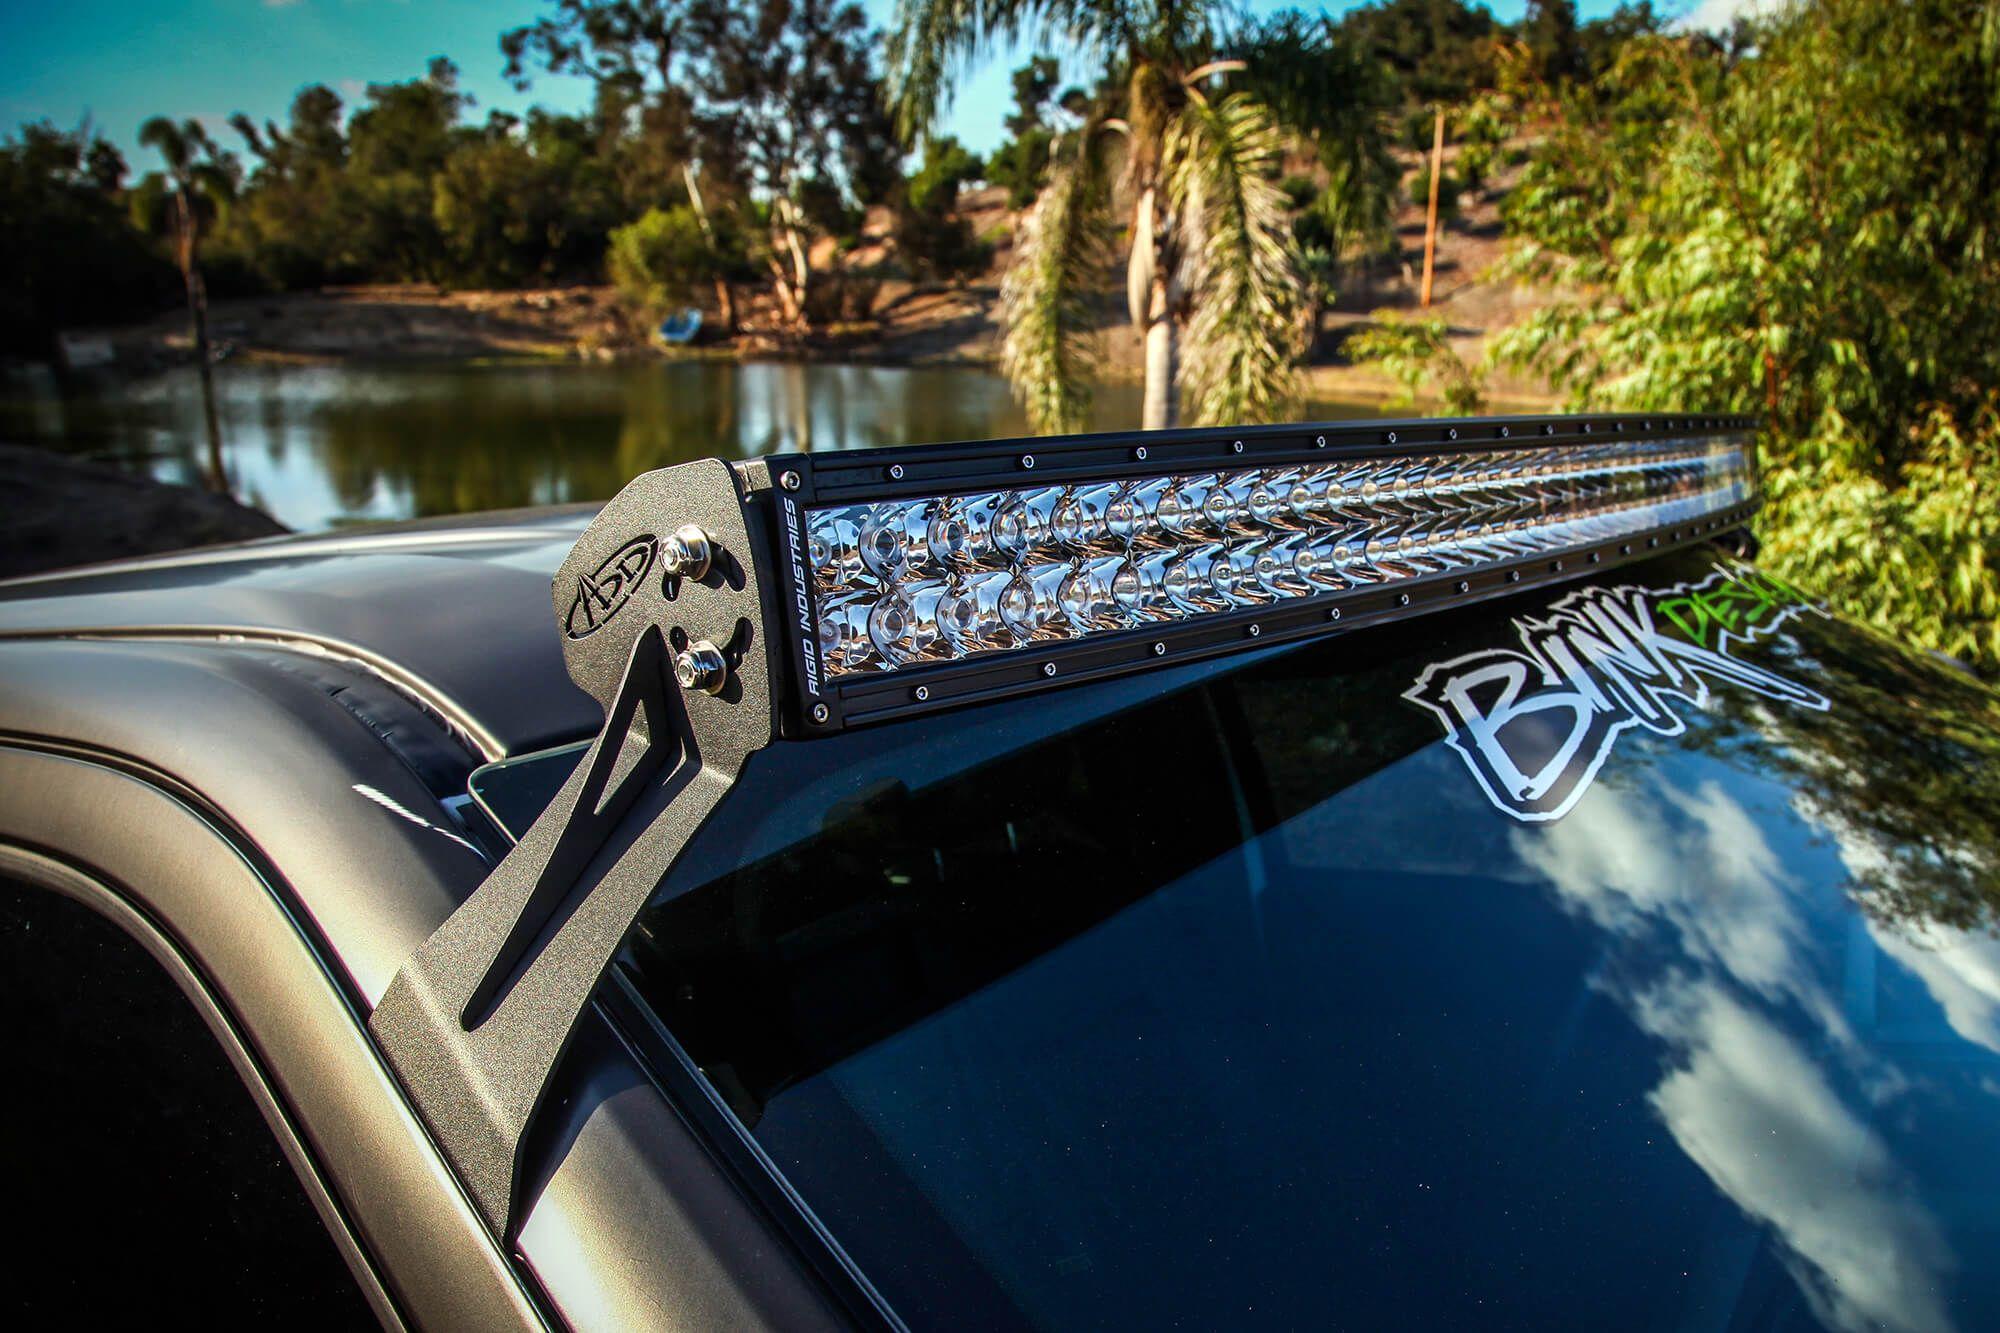 Addictive Desert Designs 54 Light Bar Roof Mount For Your